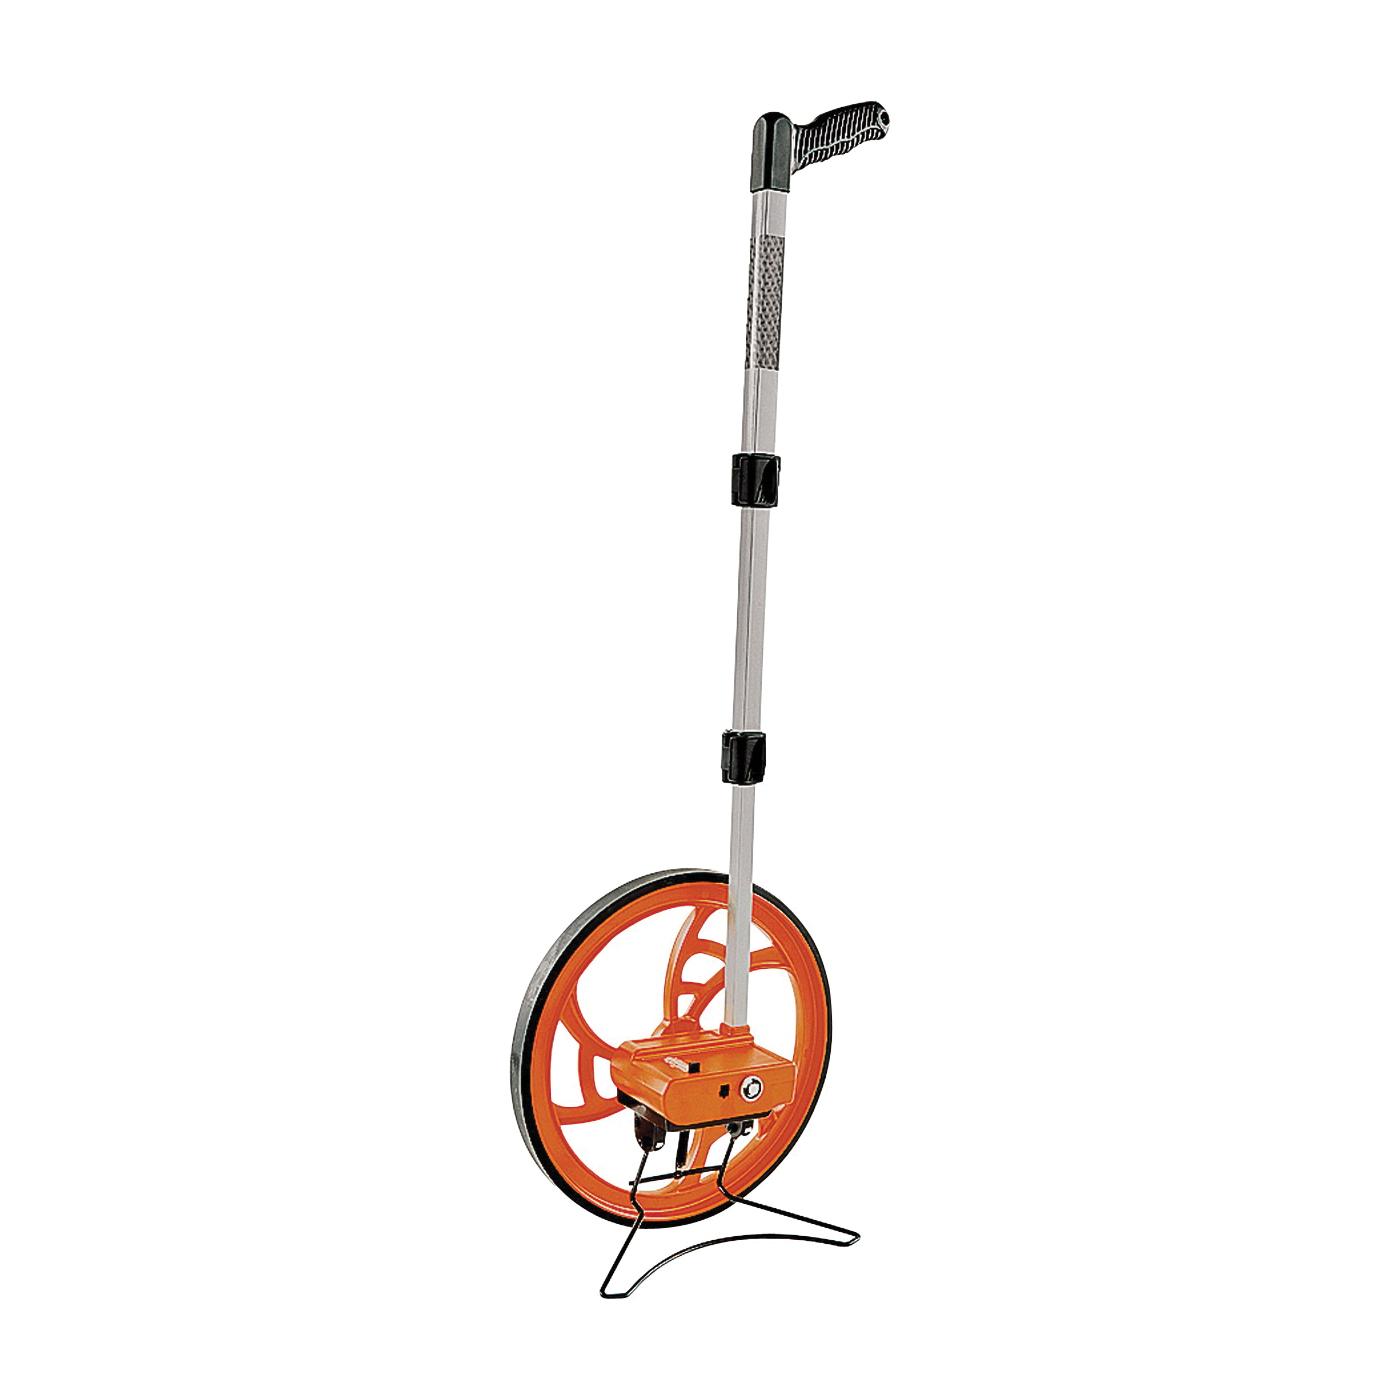 Picture of KESON Roadrunner RR318N Measuring Wheel, 9999.9 ft, 12-1/2 in Wheel, Polycast Wheel, ABS, Orange